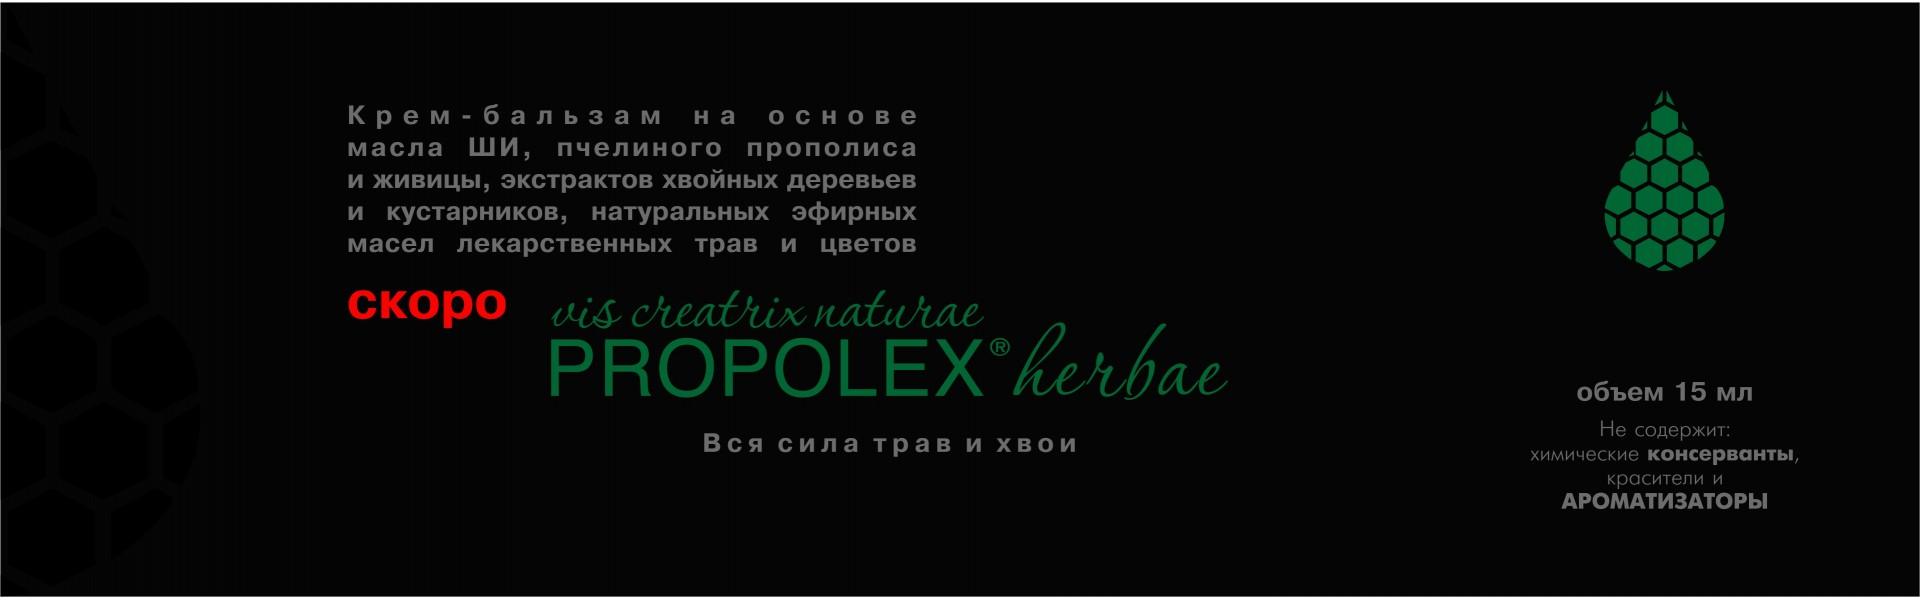 propolex herbae